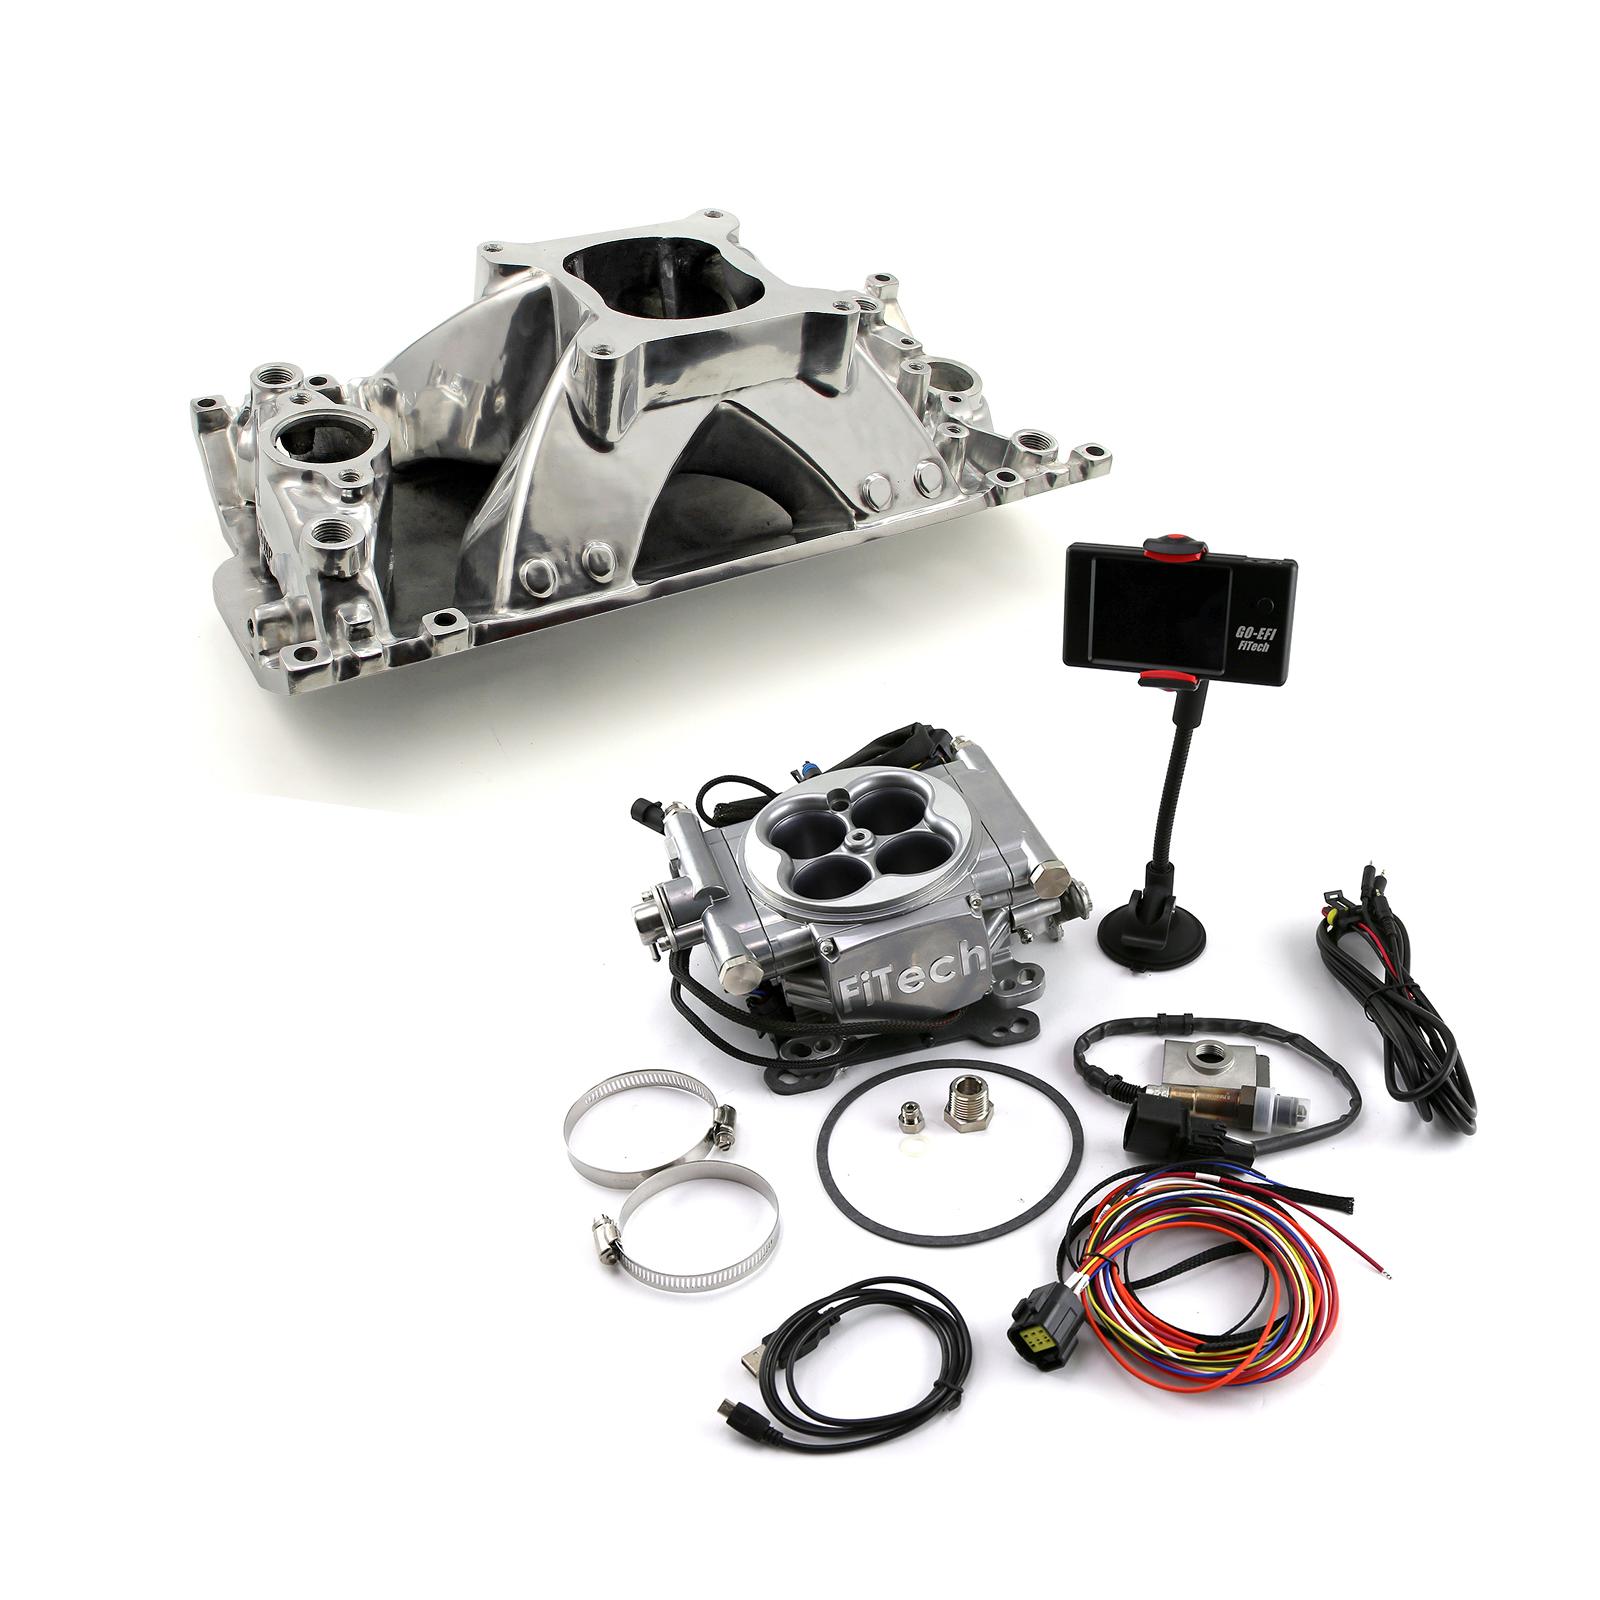 Chevy BBC 454 Holeshot Oval Port Manifold & FiTech Go EFI 30001 Fuel Injection